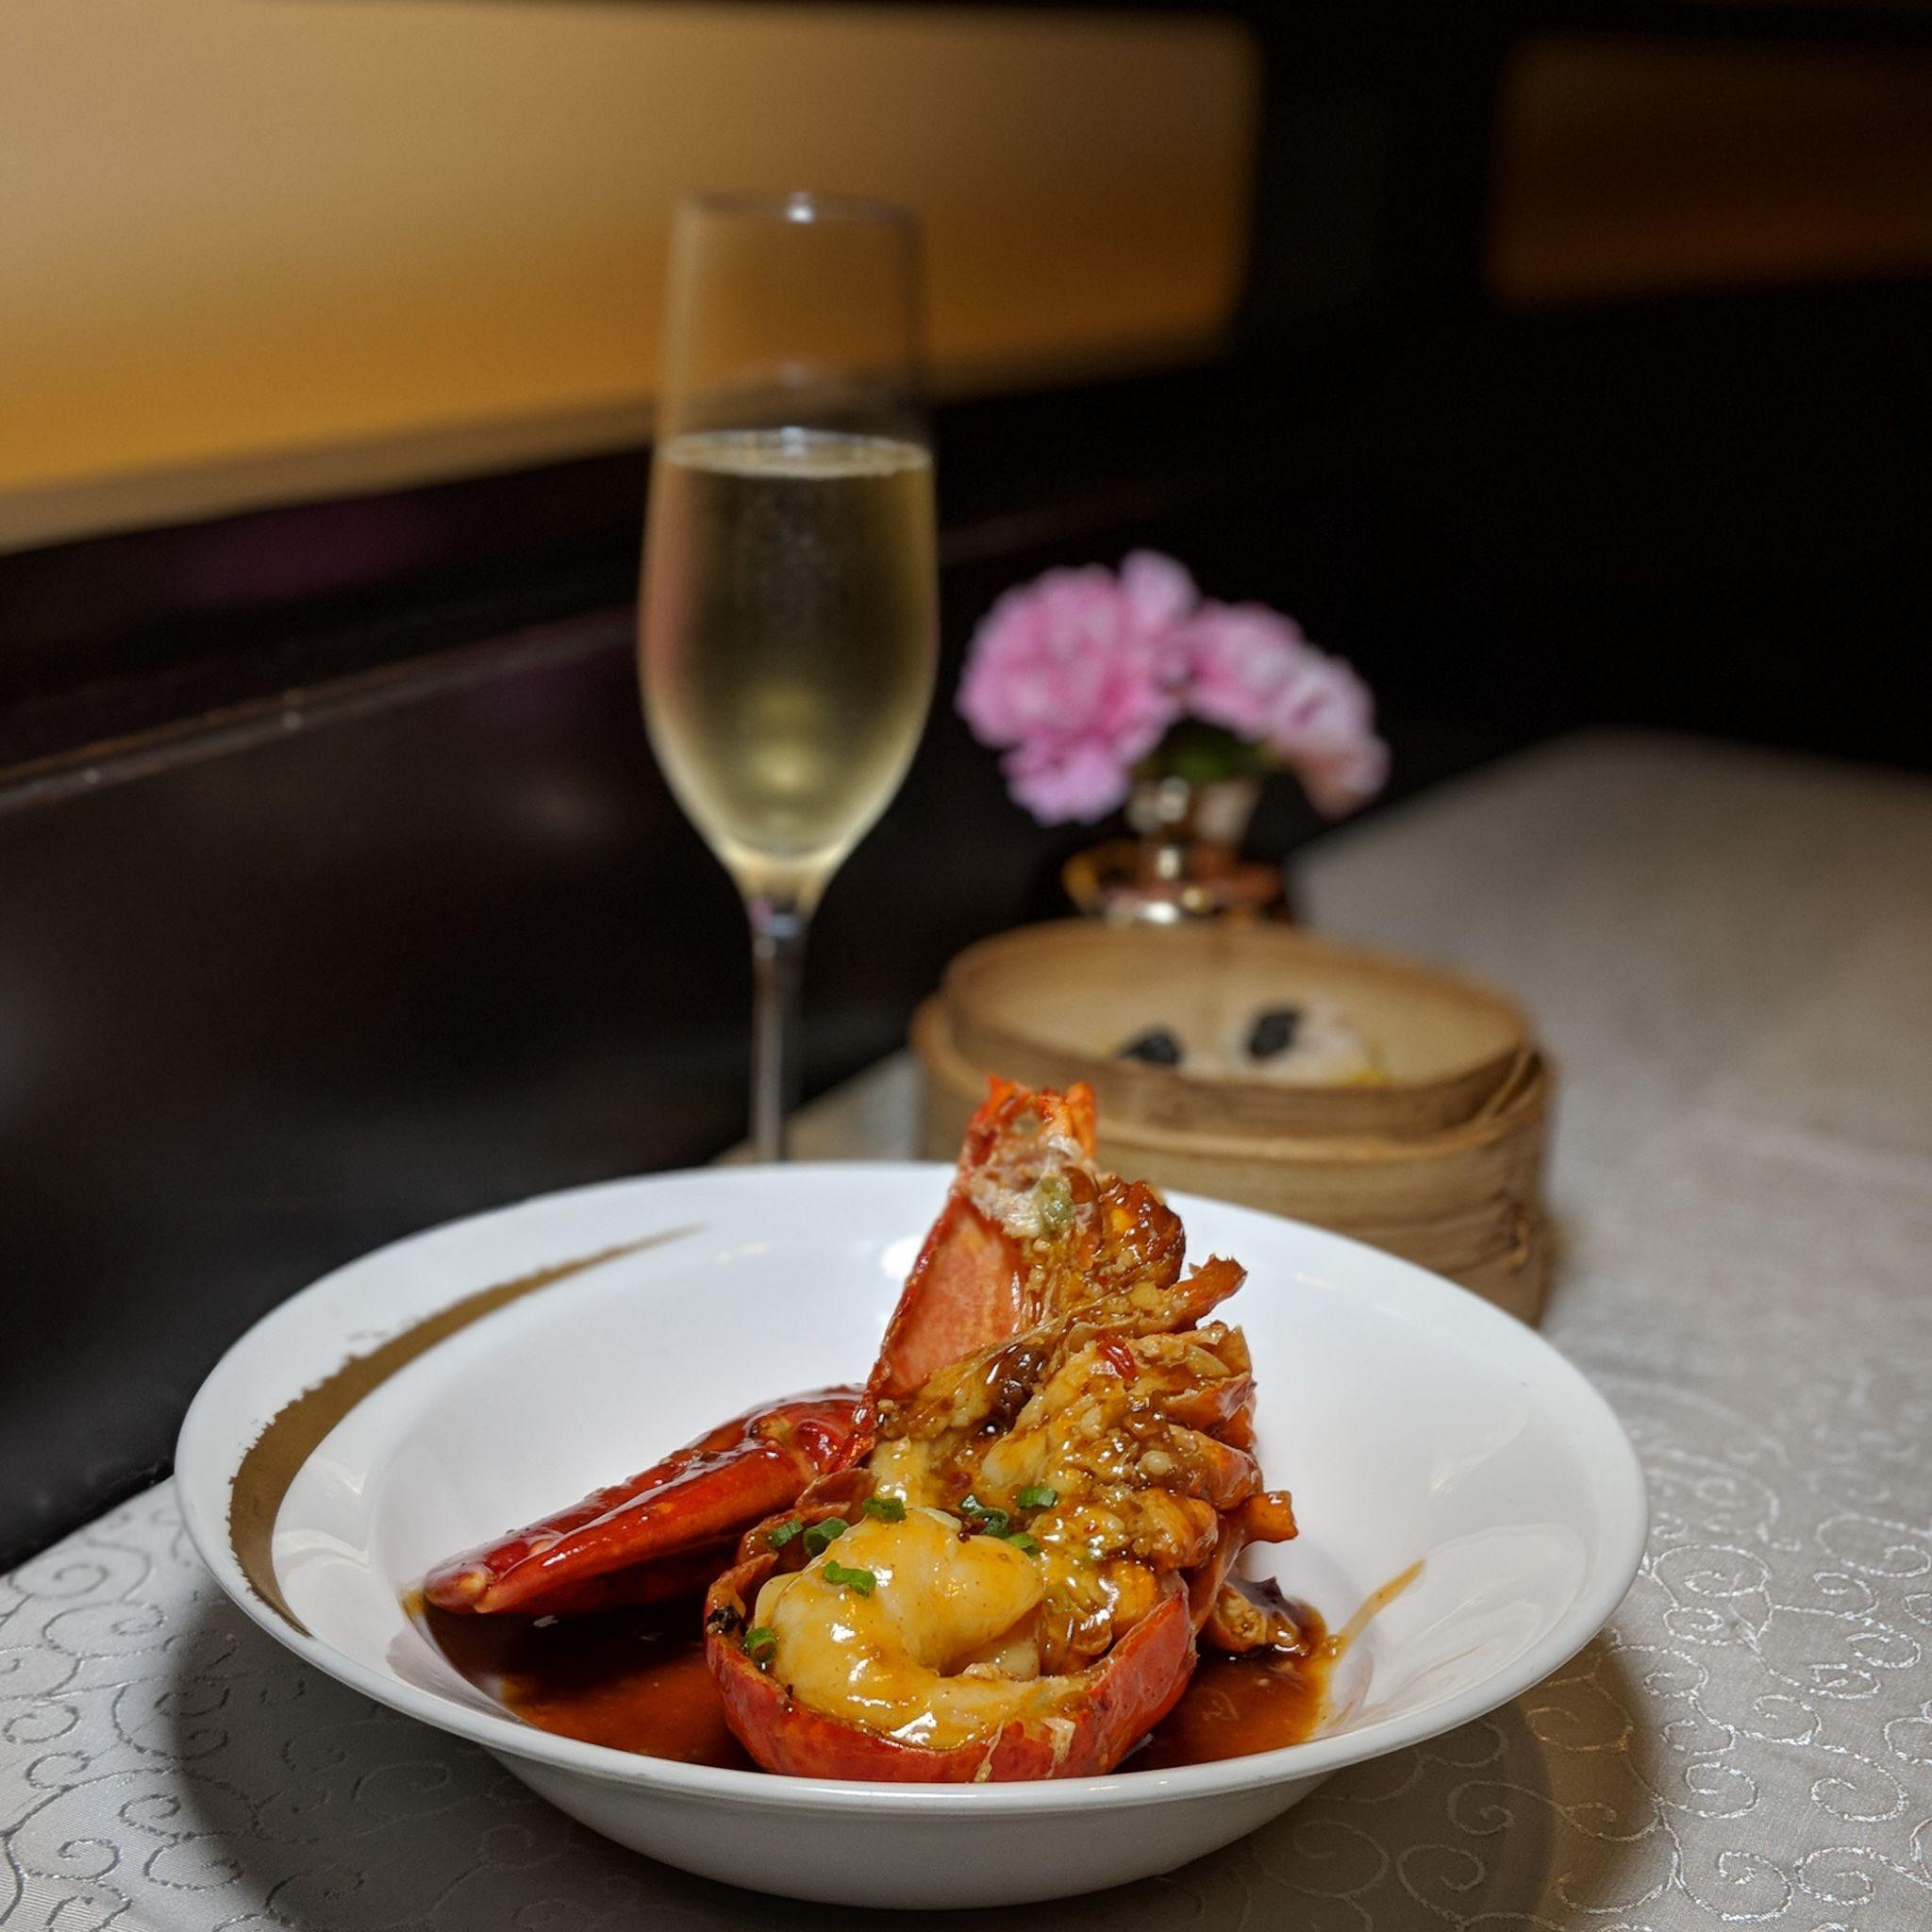 The St. Regis Singapore Yan Ting Champagne Dim Sum Brunch